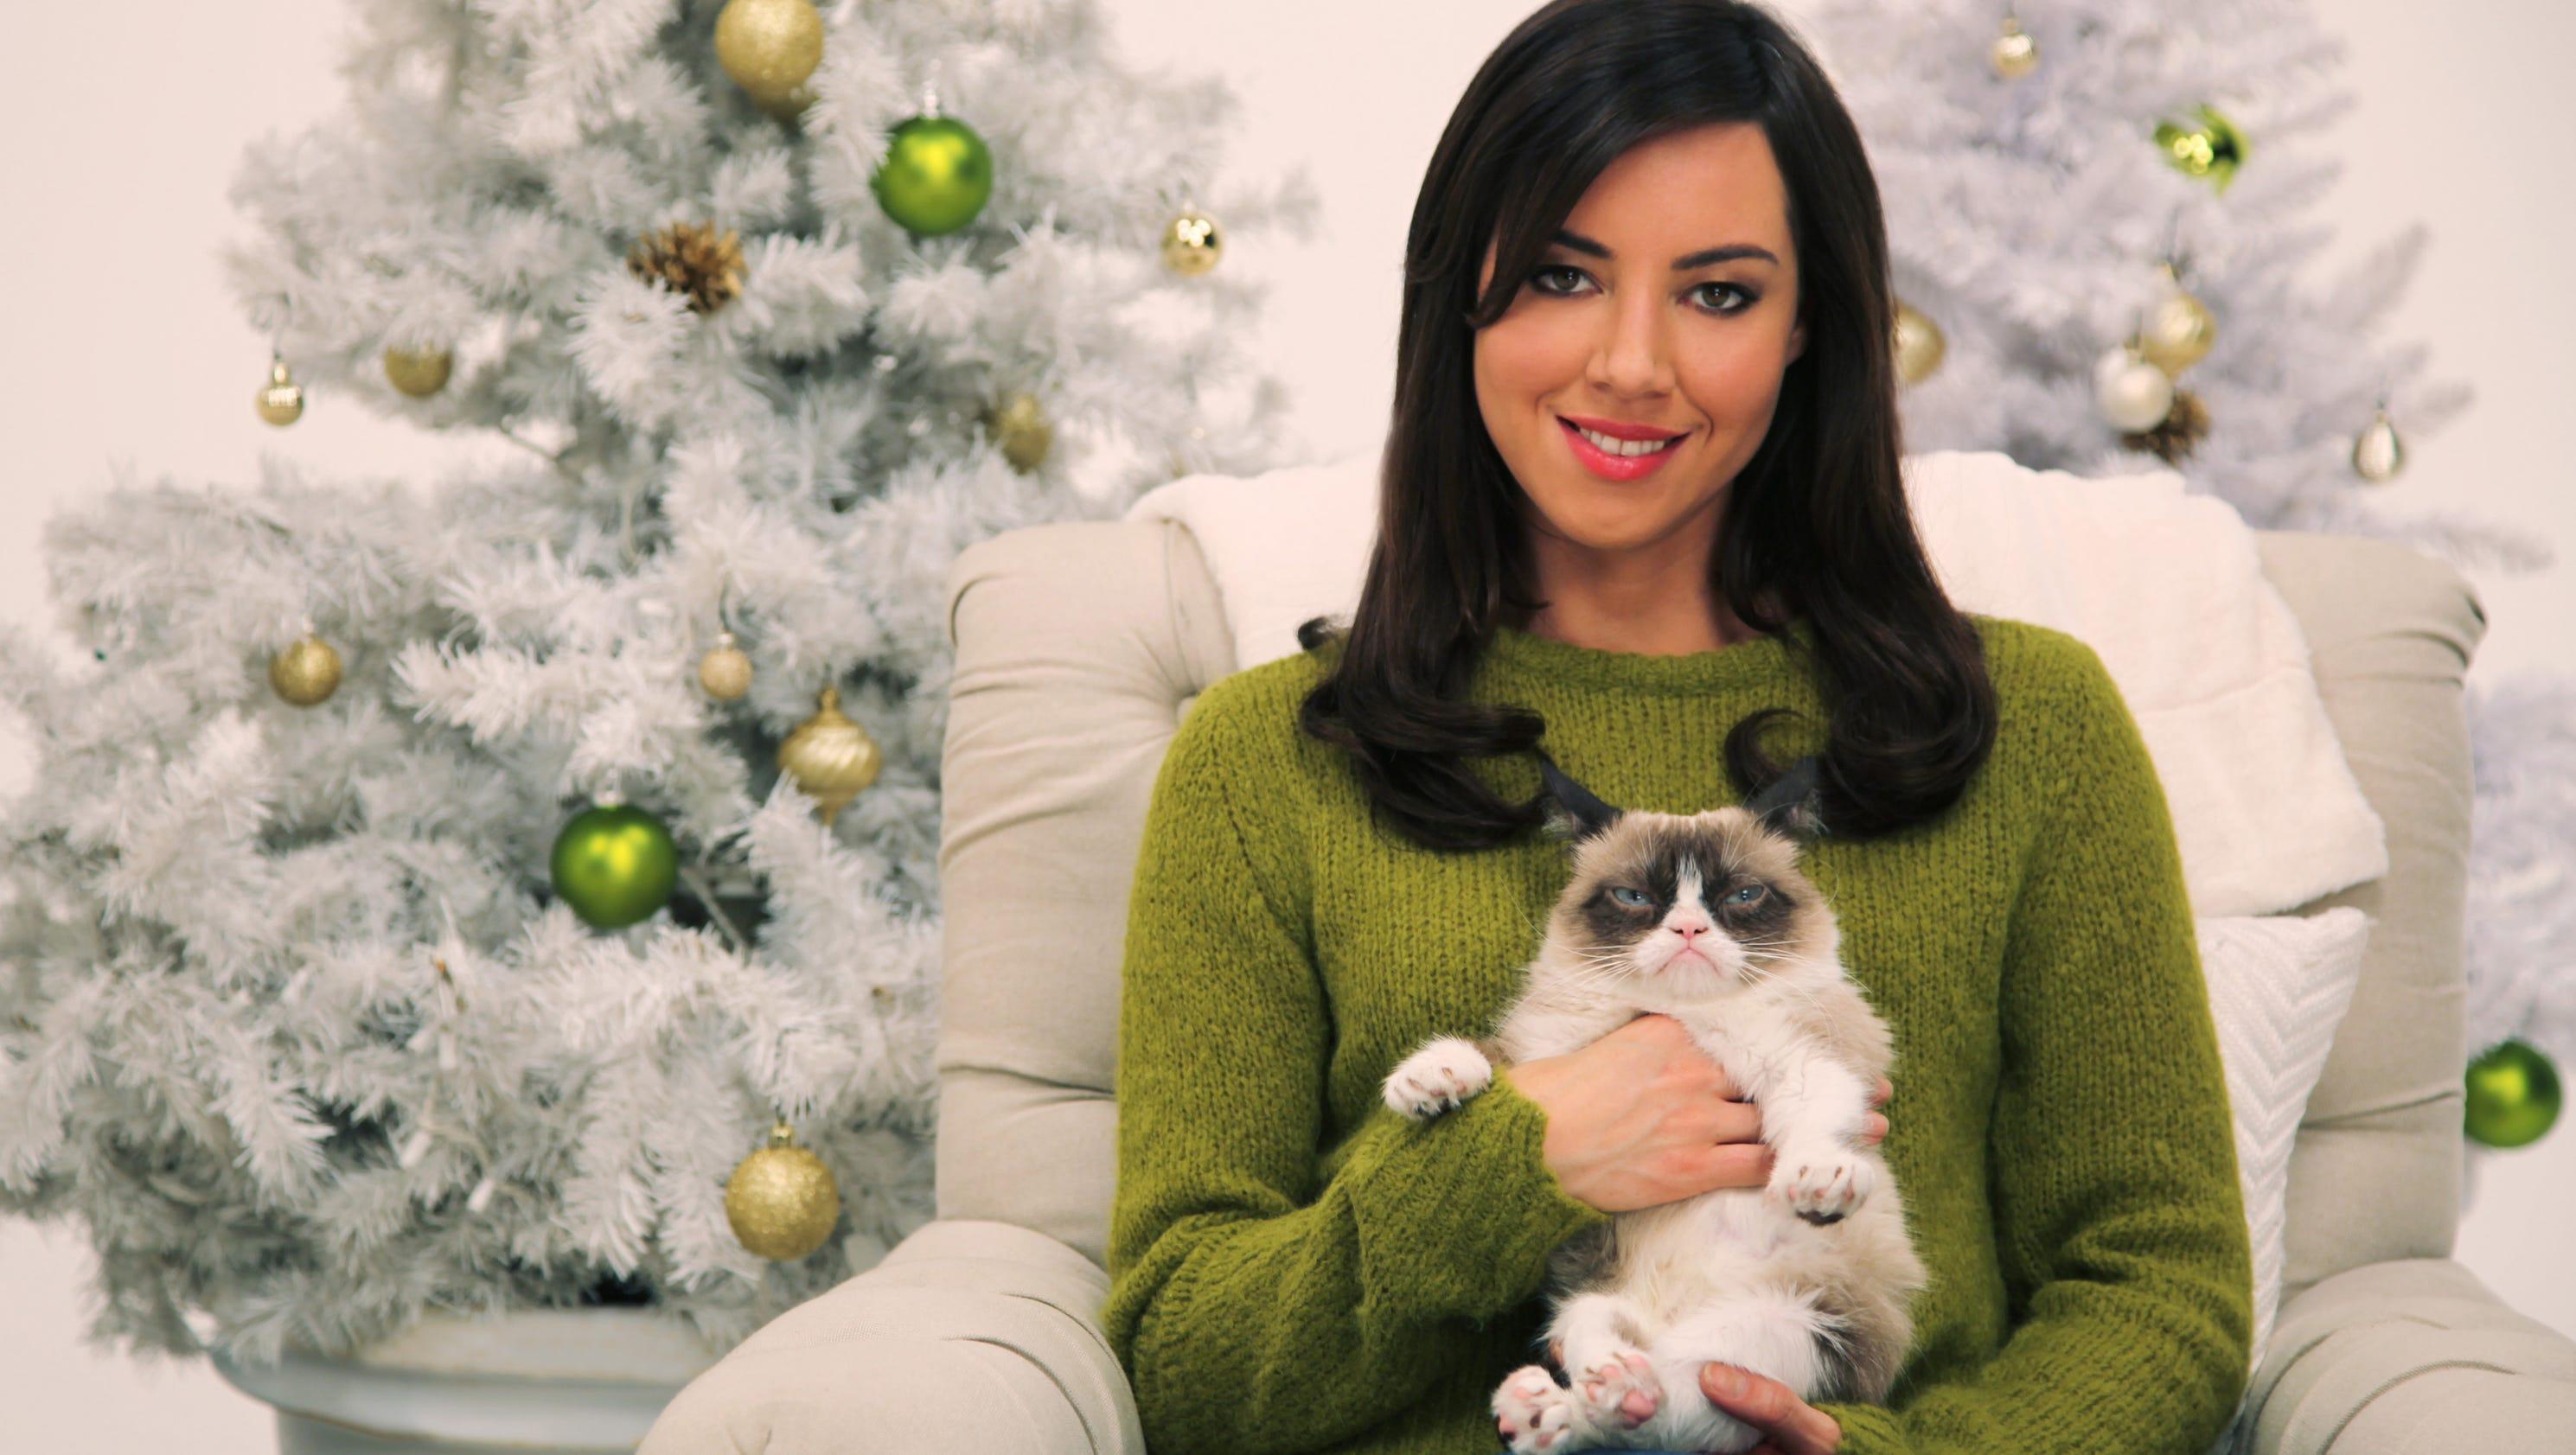 aubrey plaza has worst christmas ever as grumpy cat